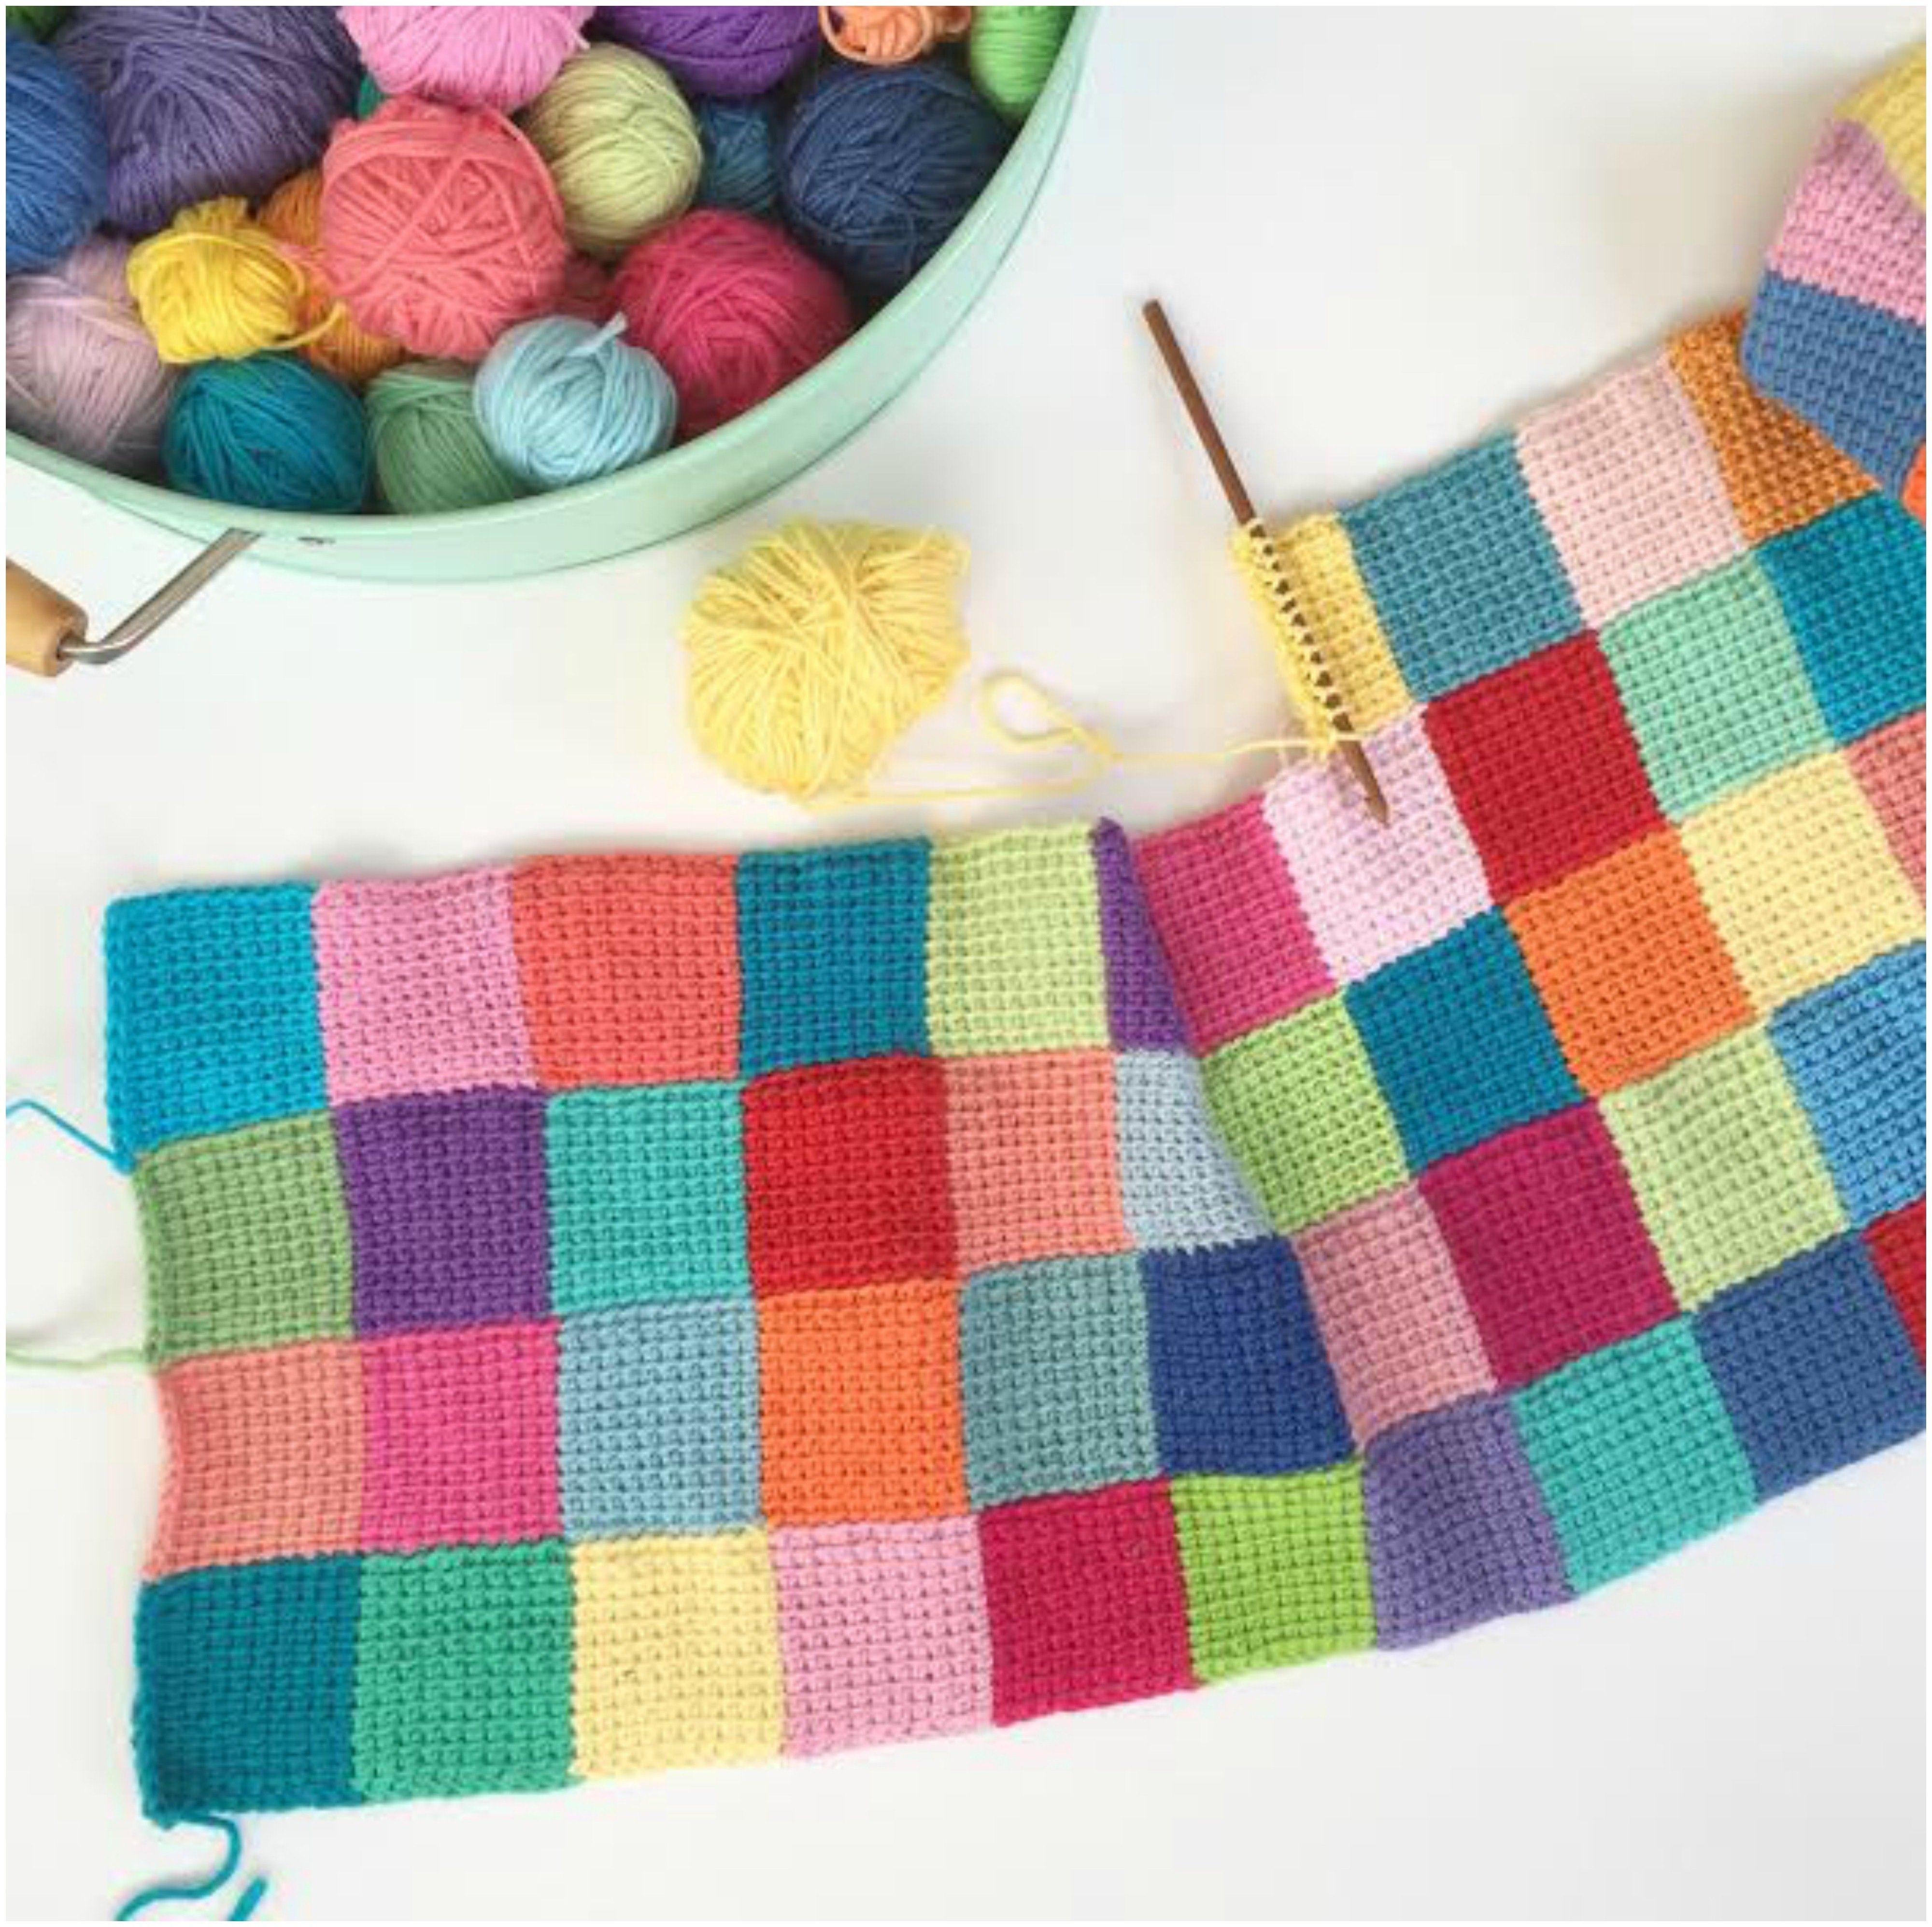 Entrelac Blanket Free Crochet Pattern | Stricken | Pinterest ...